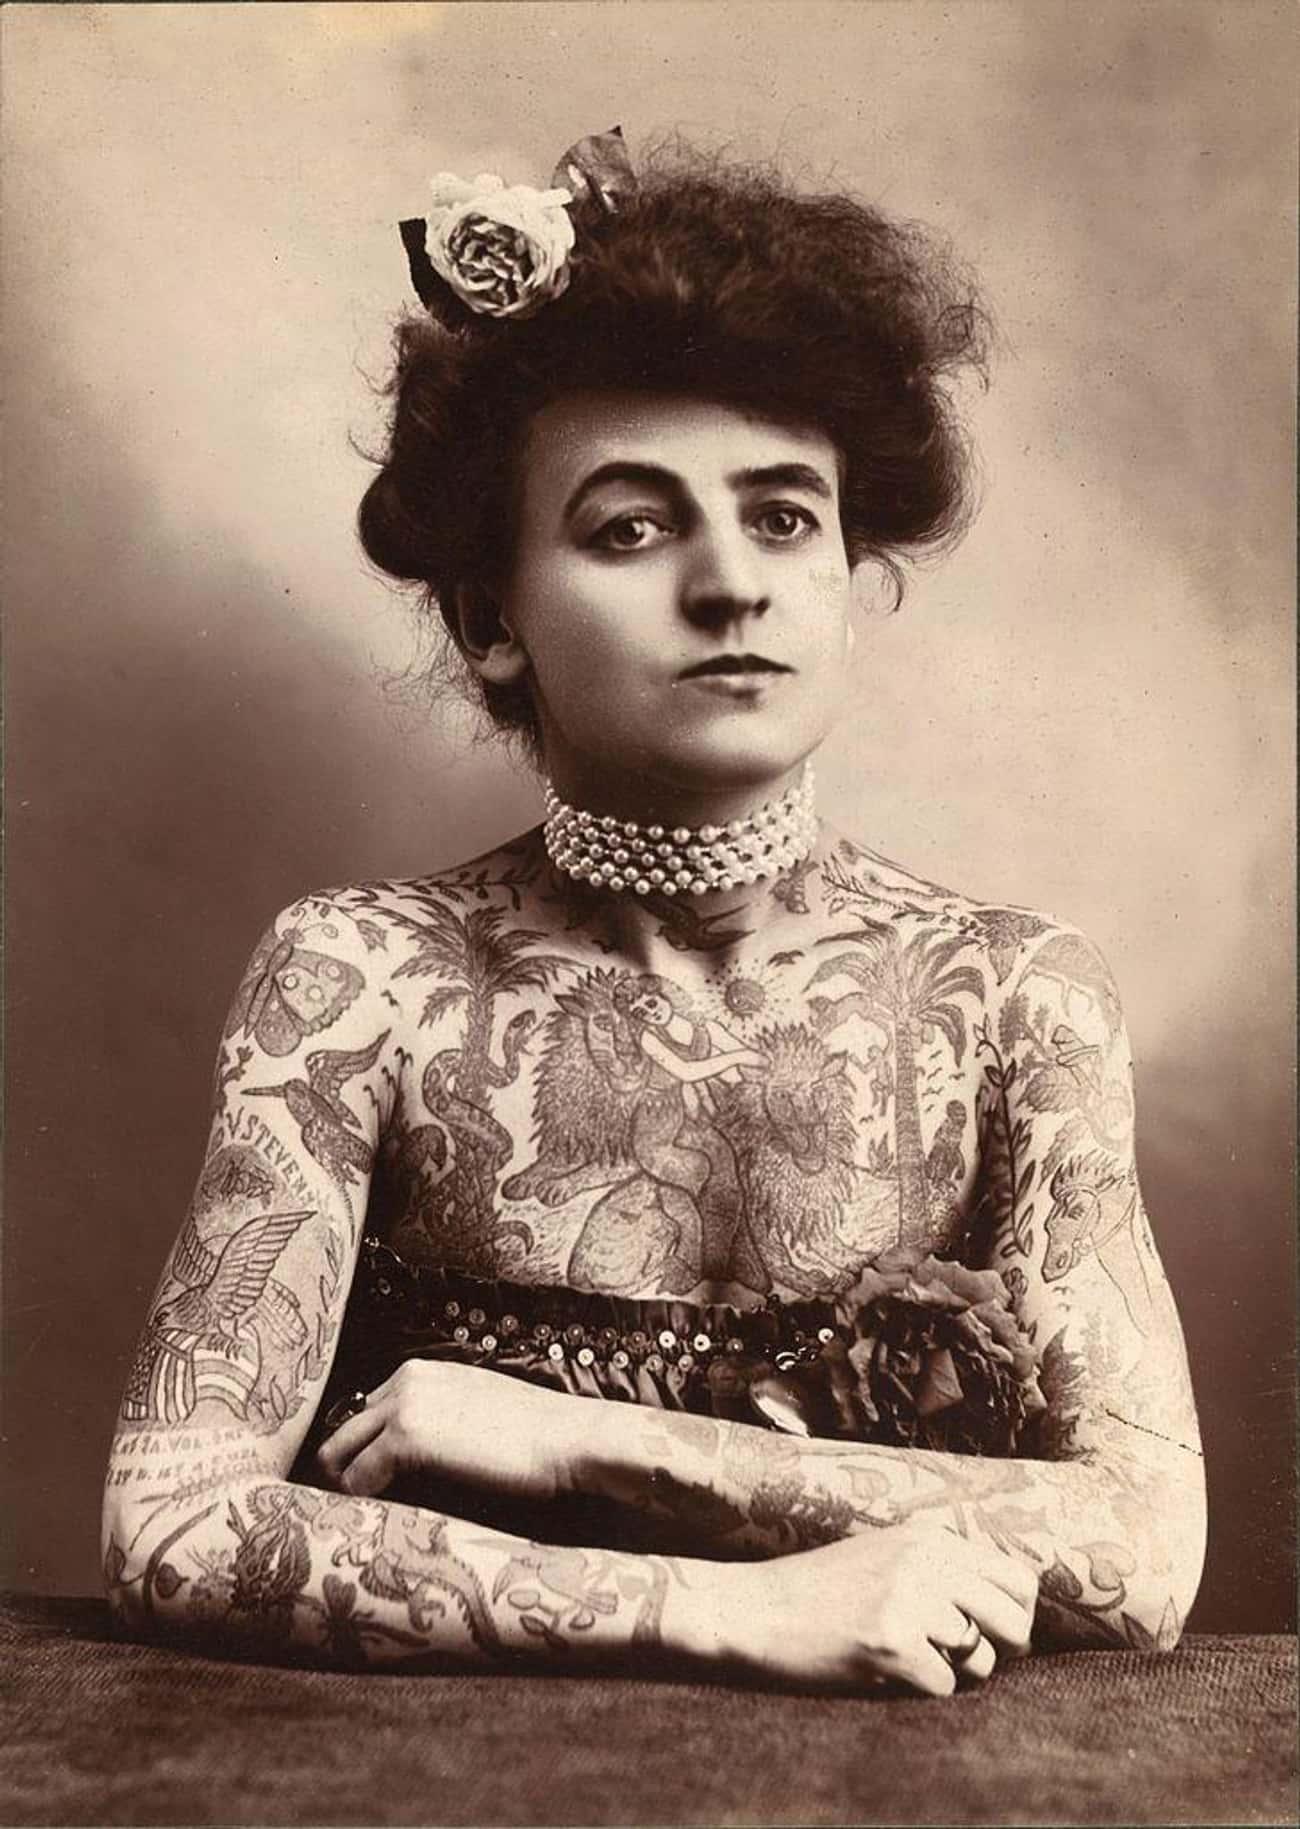 1920s: Cosmetic Enhancements